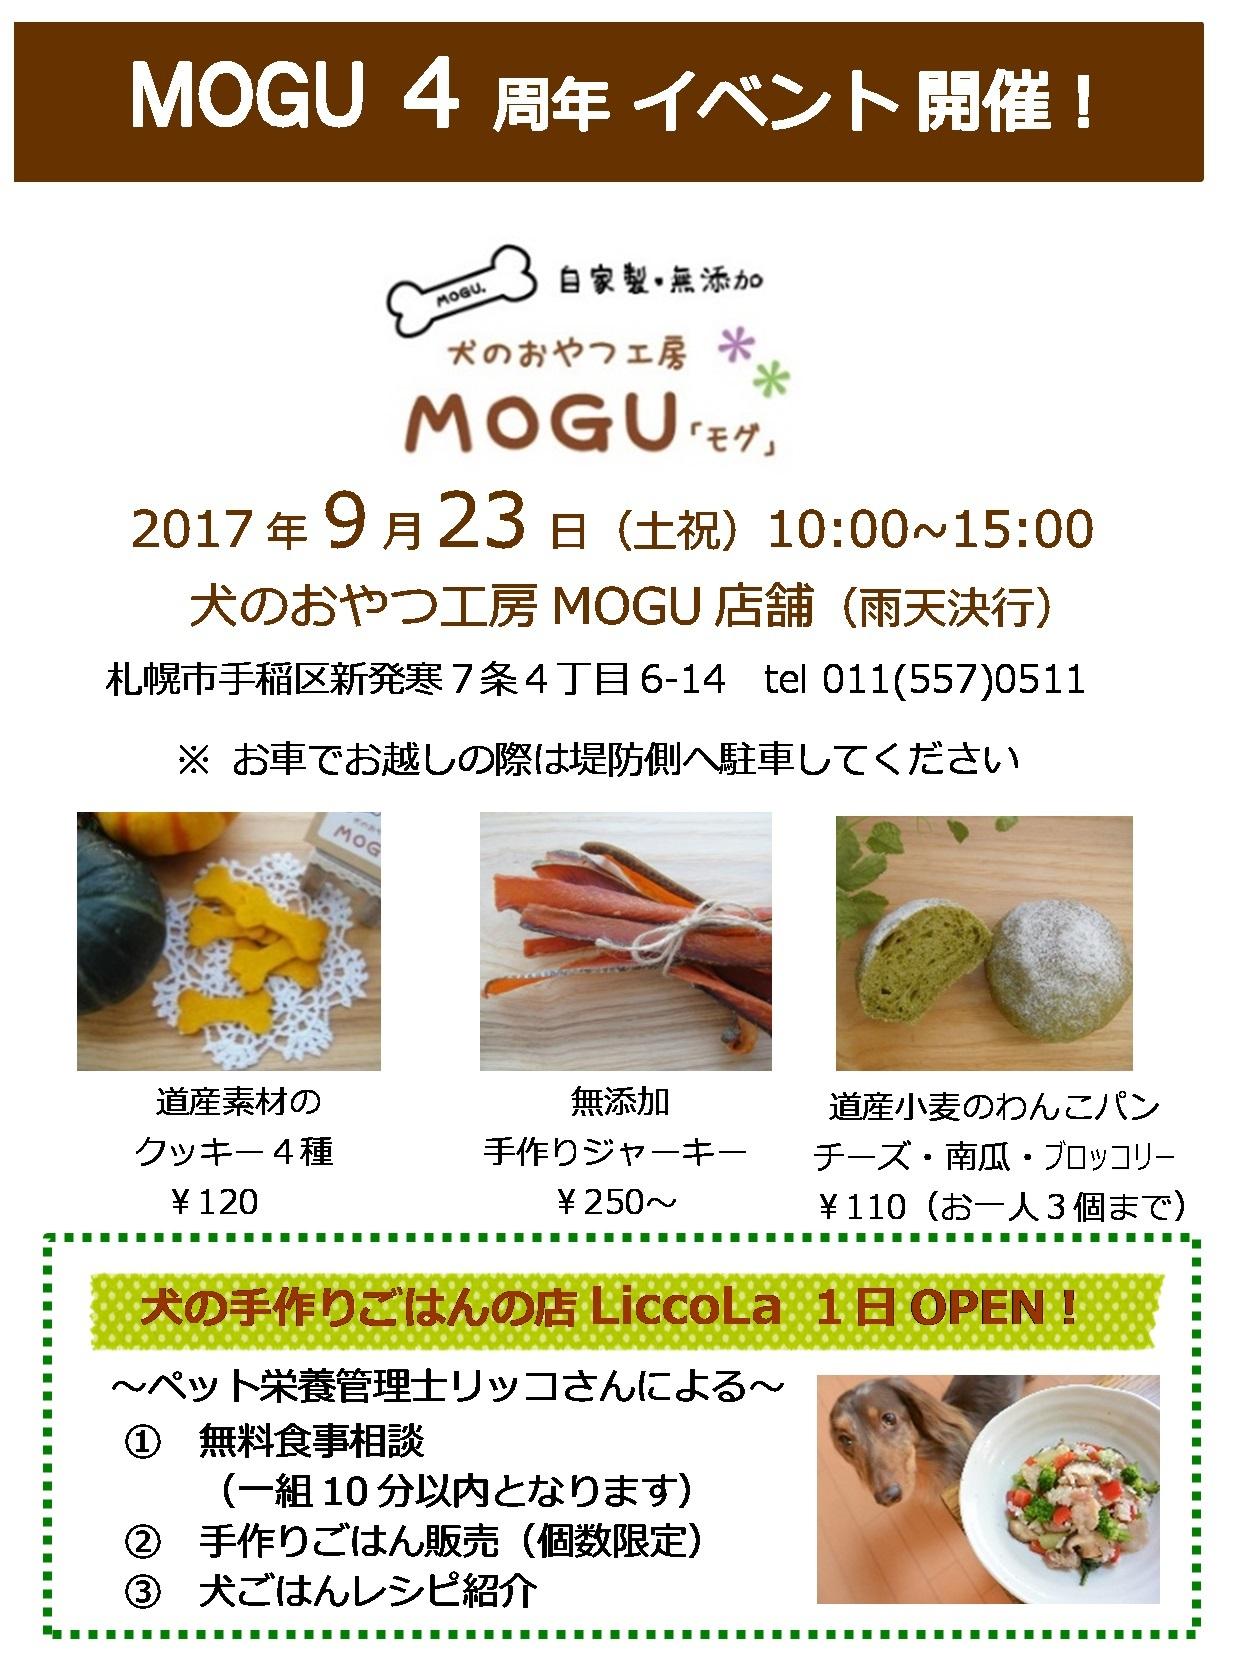 MOGU4周年(表)